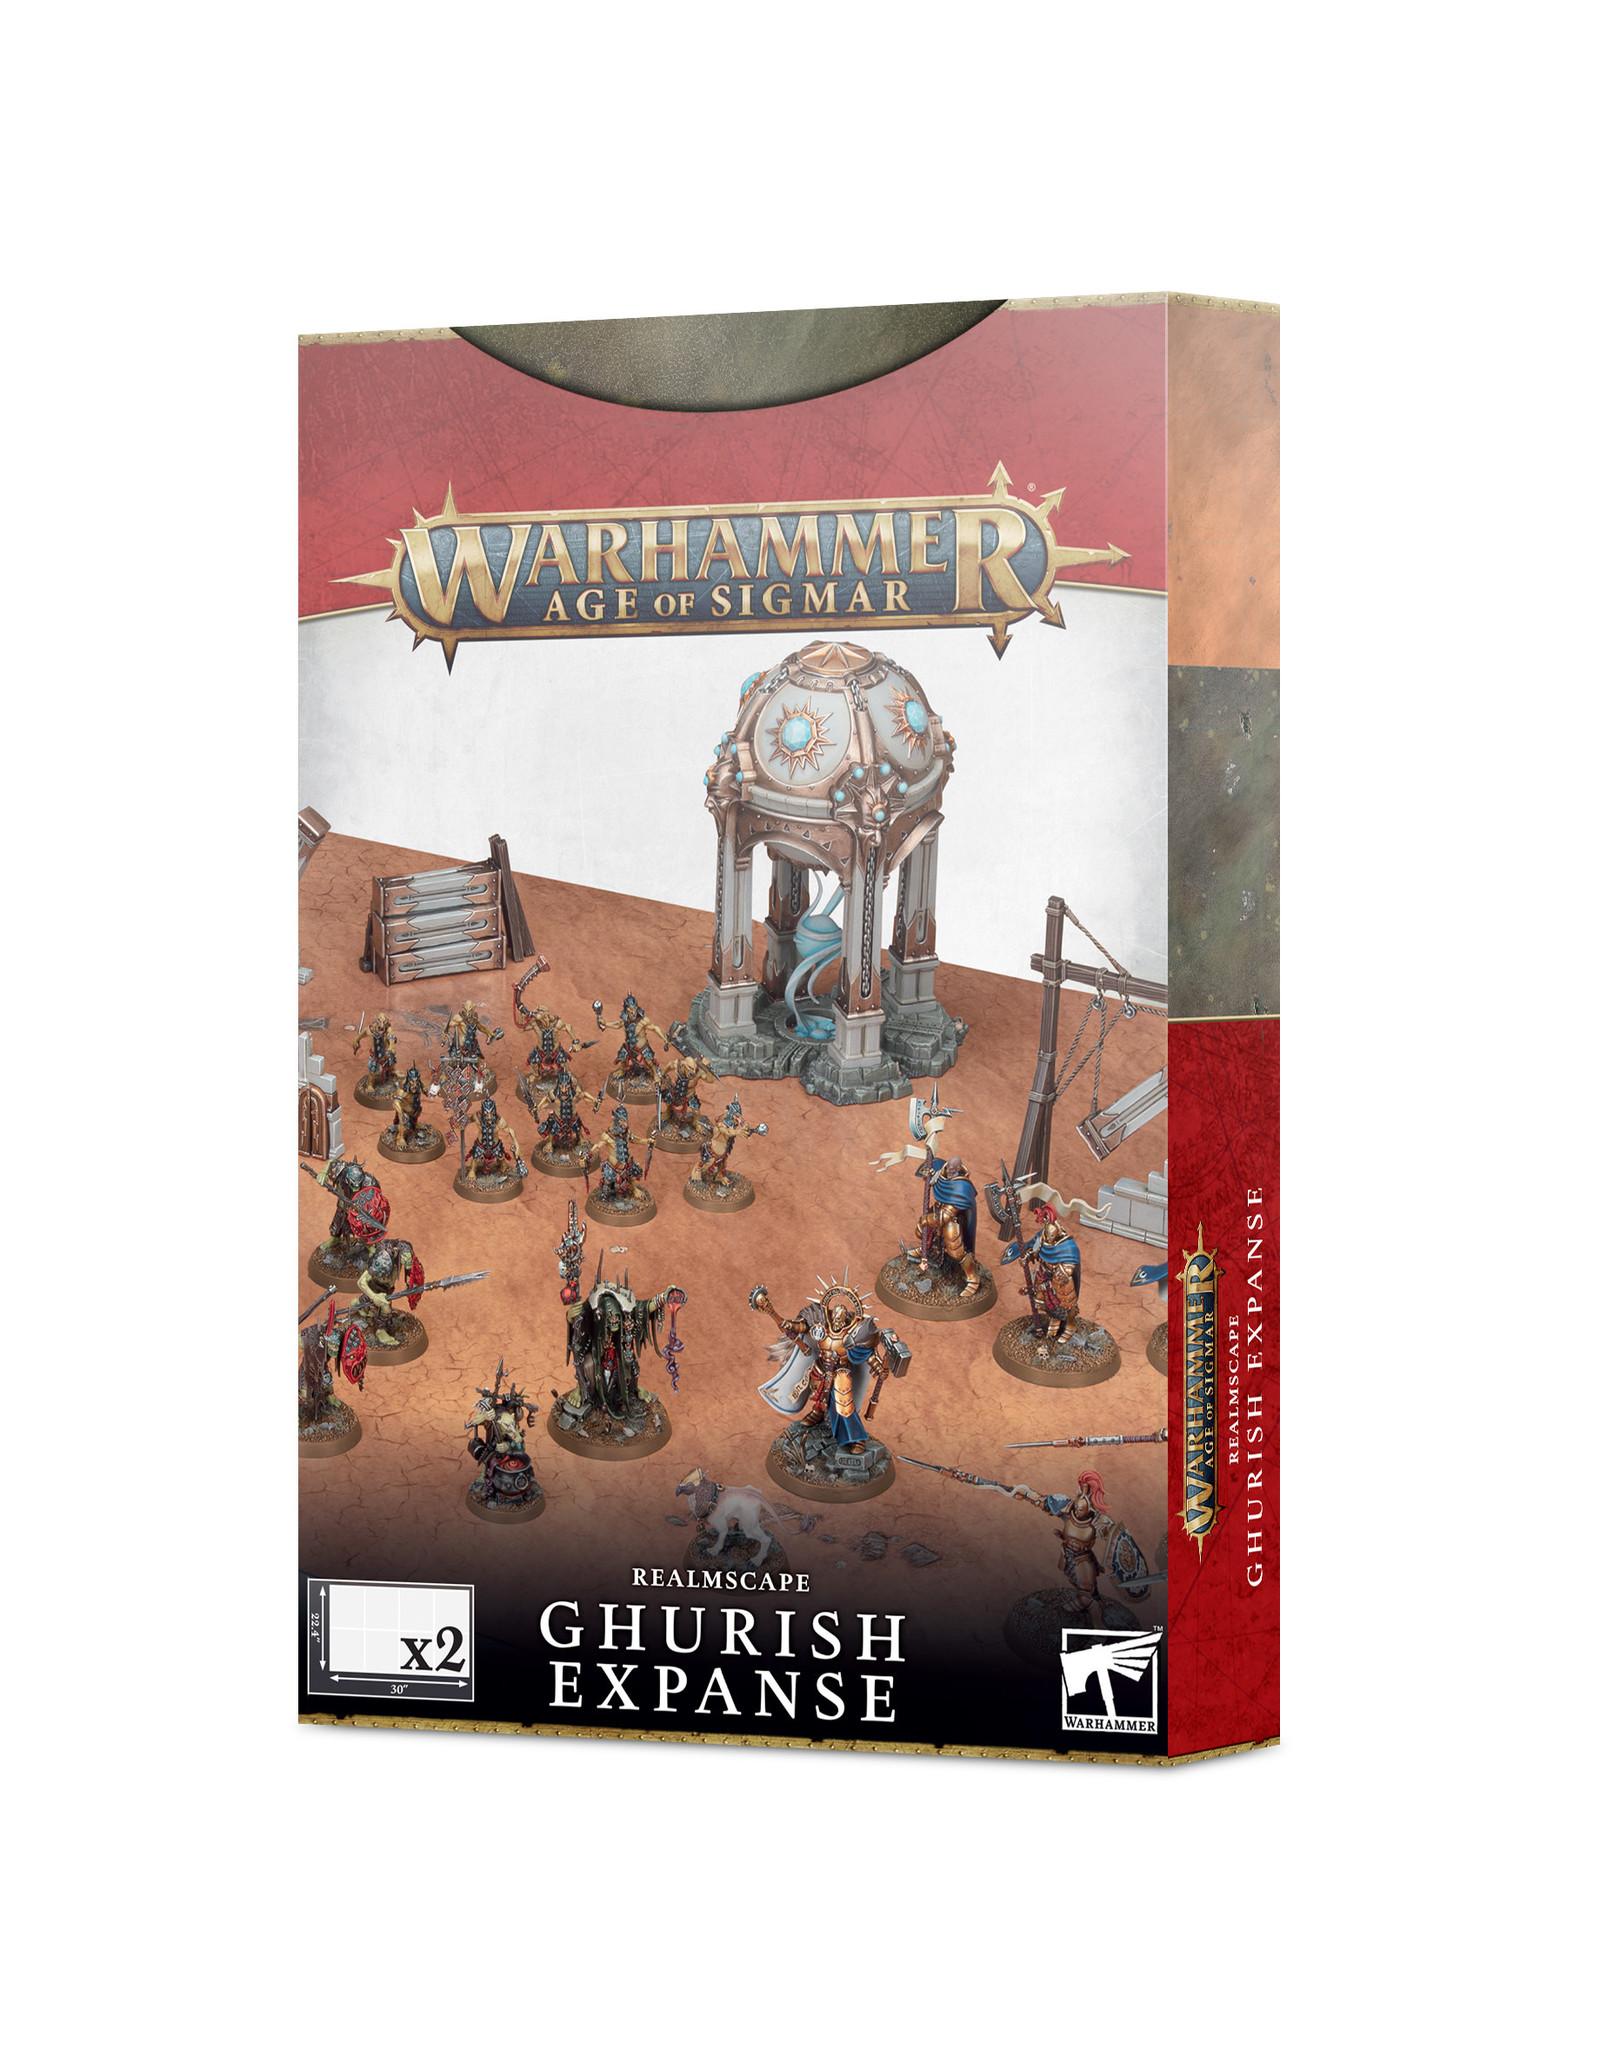 Games-Workshop AoS Realmscape: Ghurish Expanse